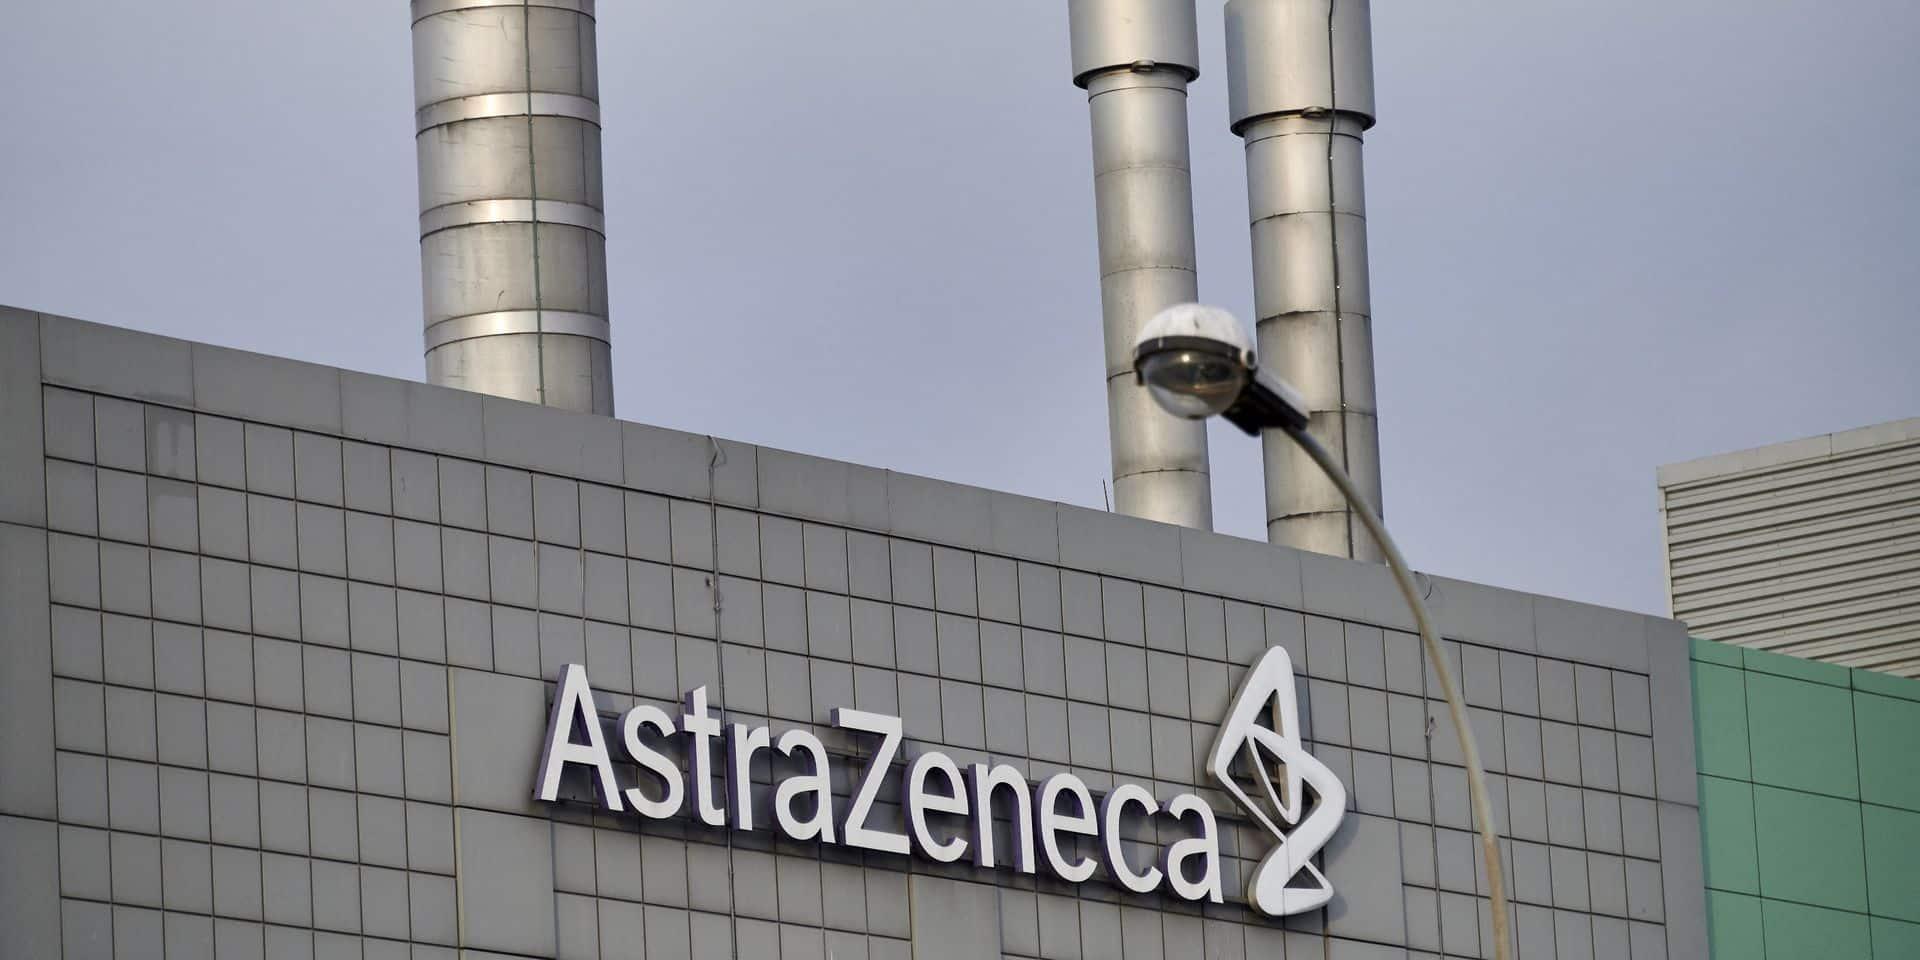 AstraZeneca a vu son bénéfice s'envoler au premier trimestre